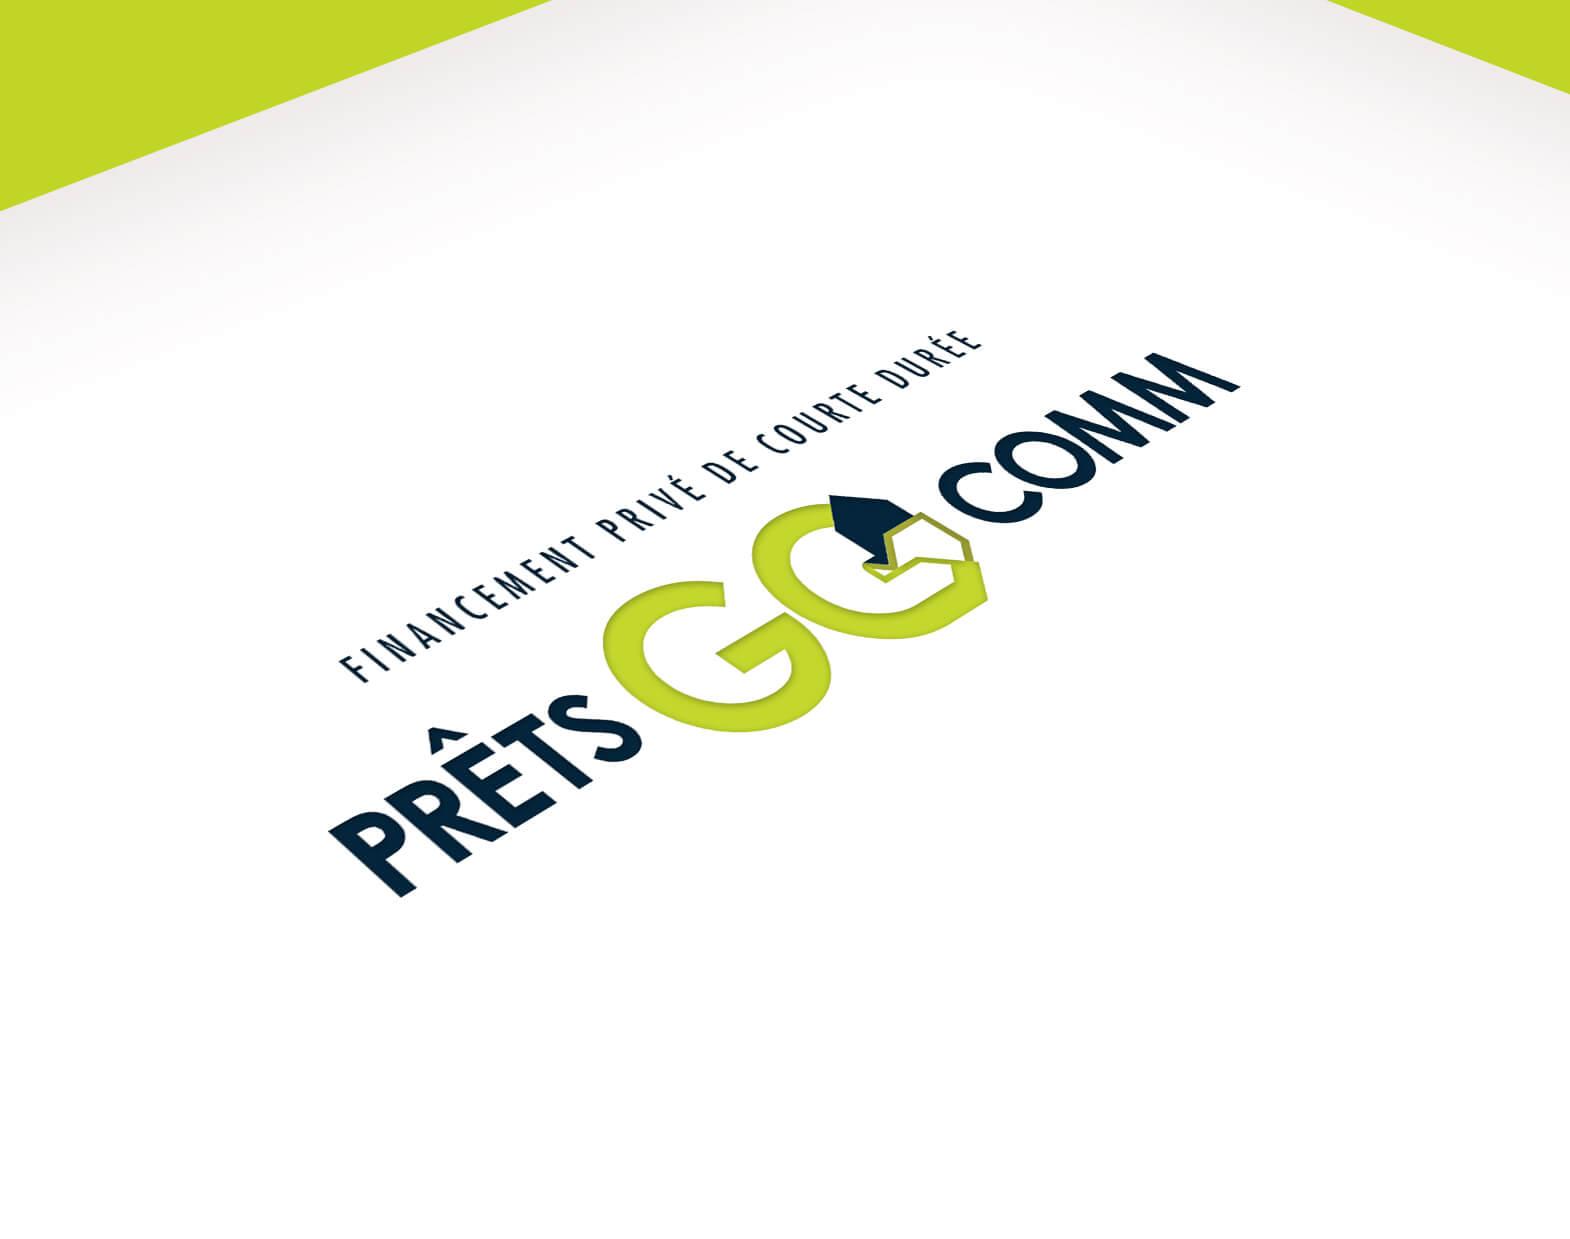 prets-go-comm-graphisme-quebec